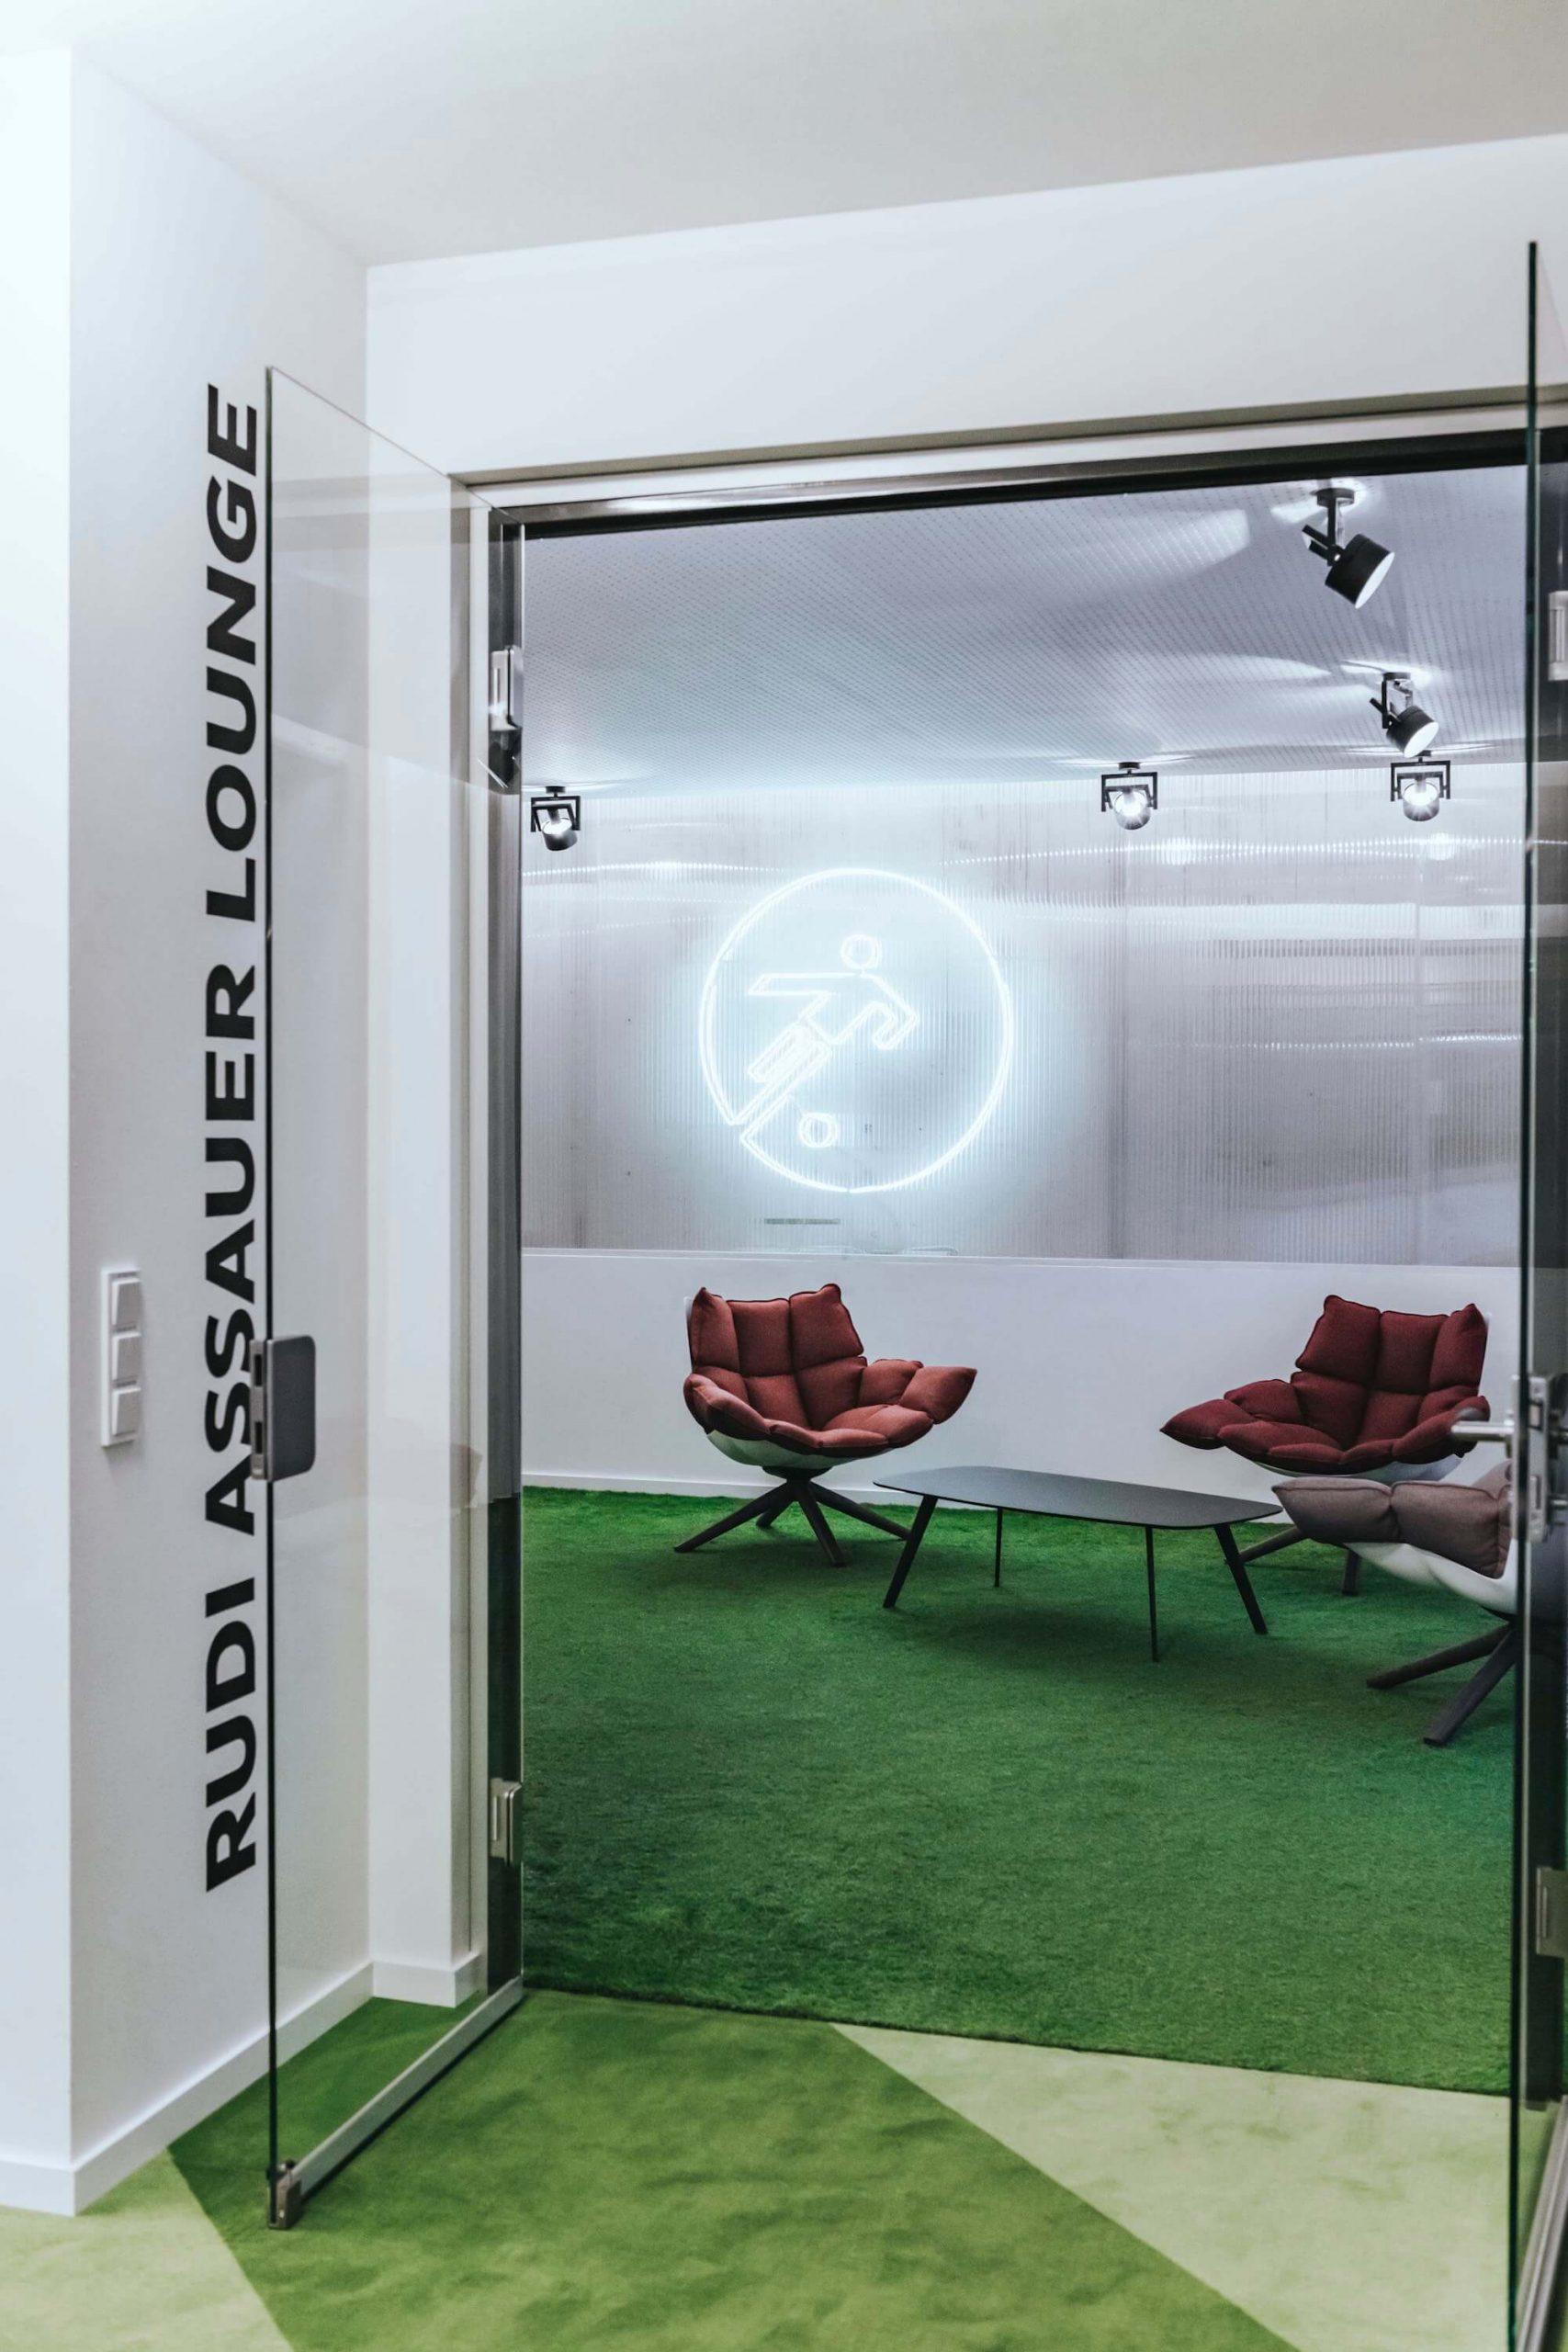 Onefootball Startup Büro TKEZ Architekten Rudi Assauer